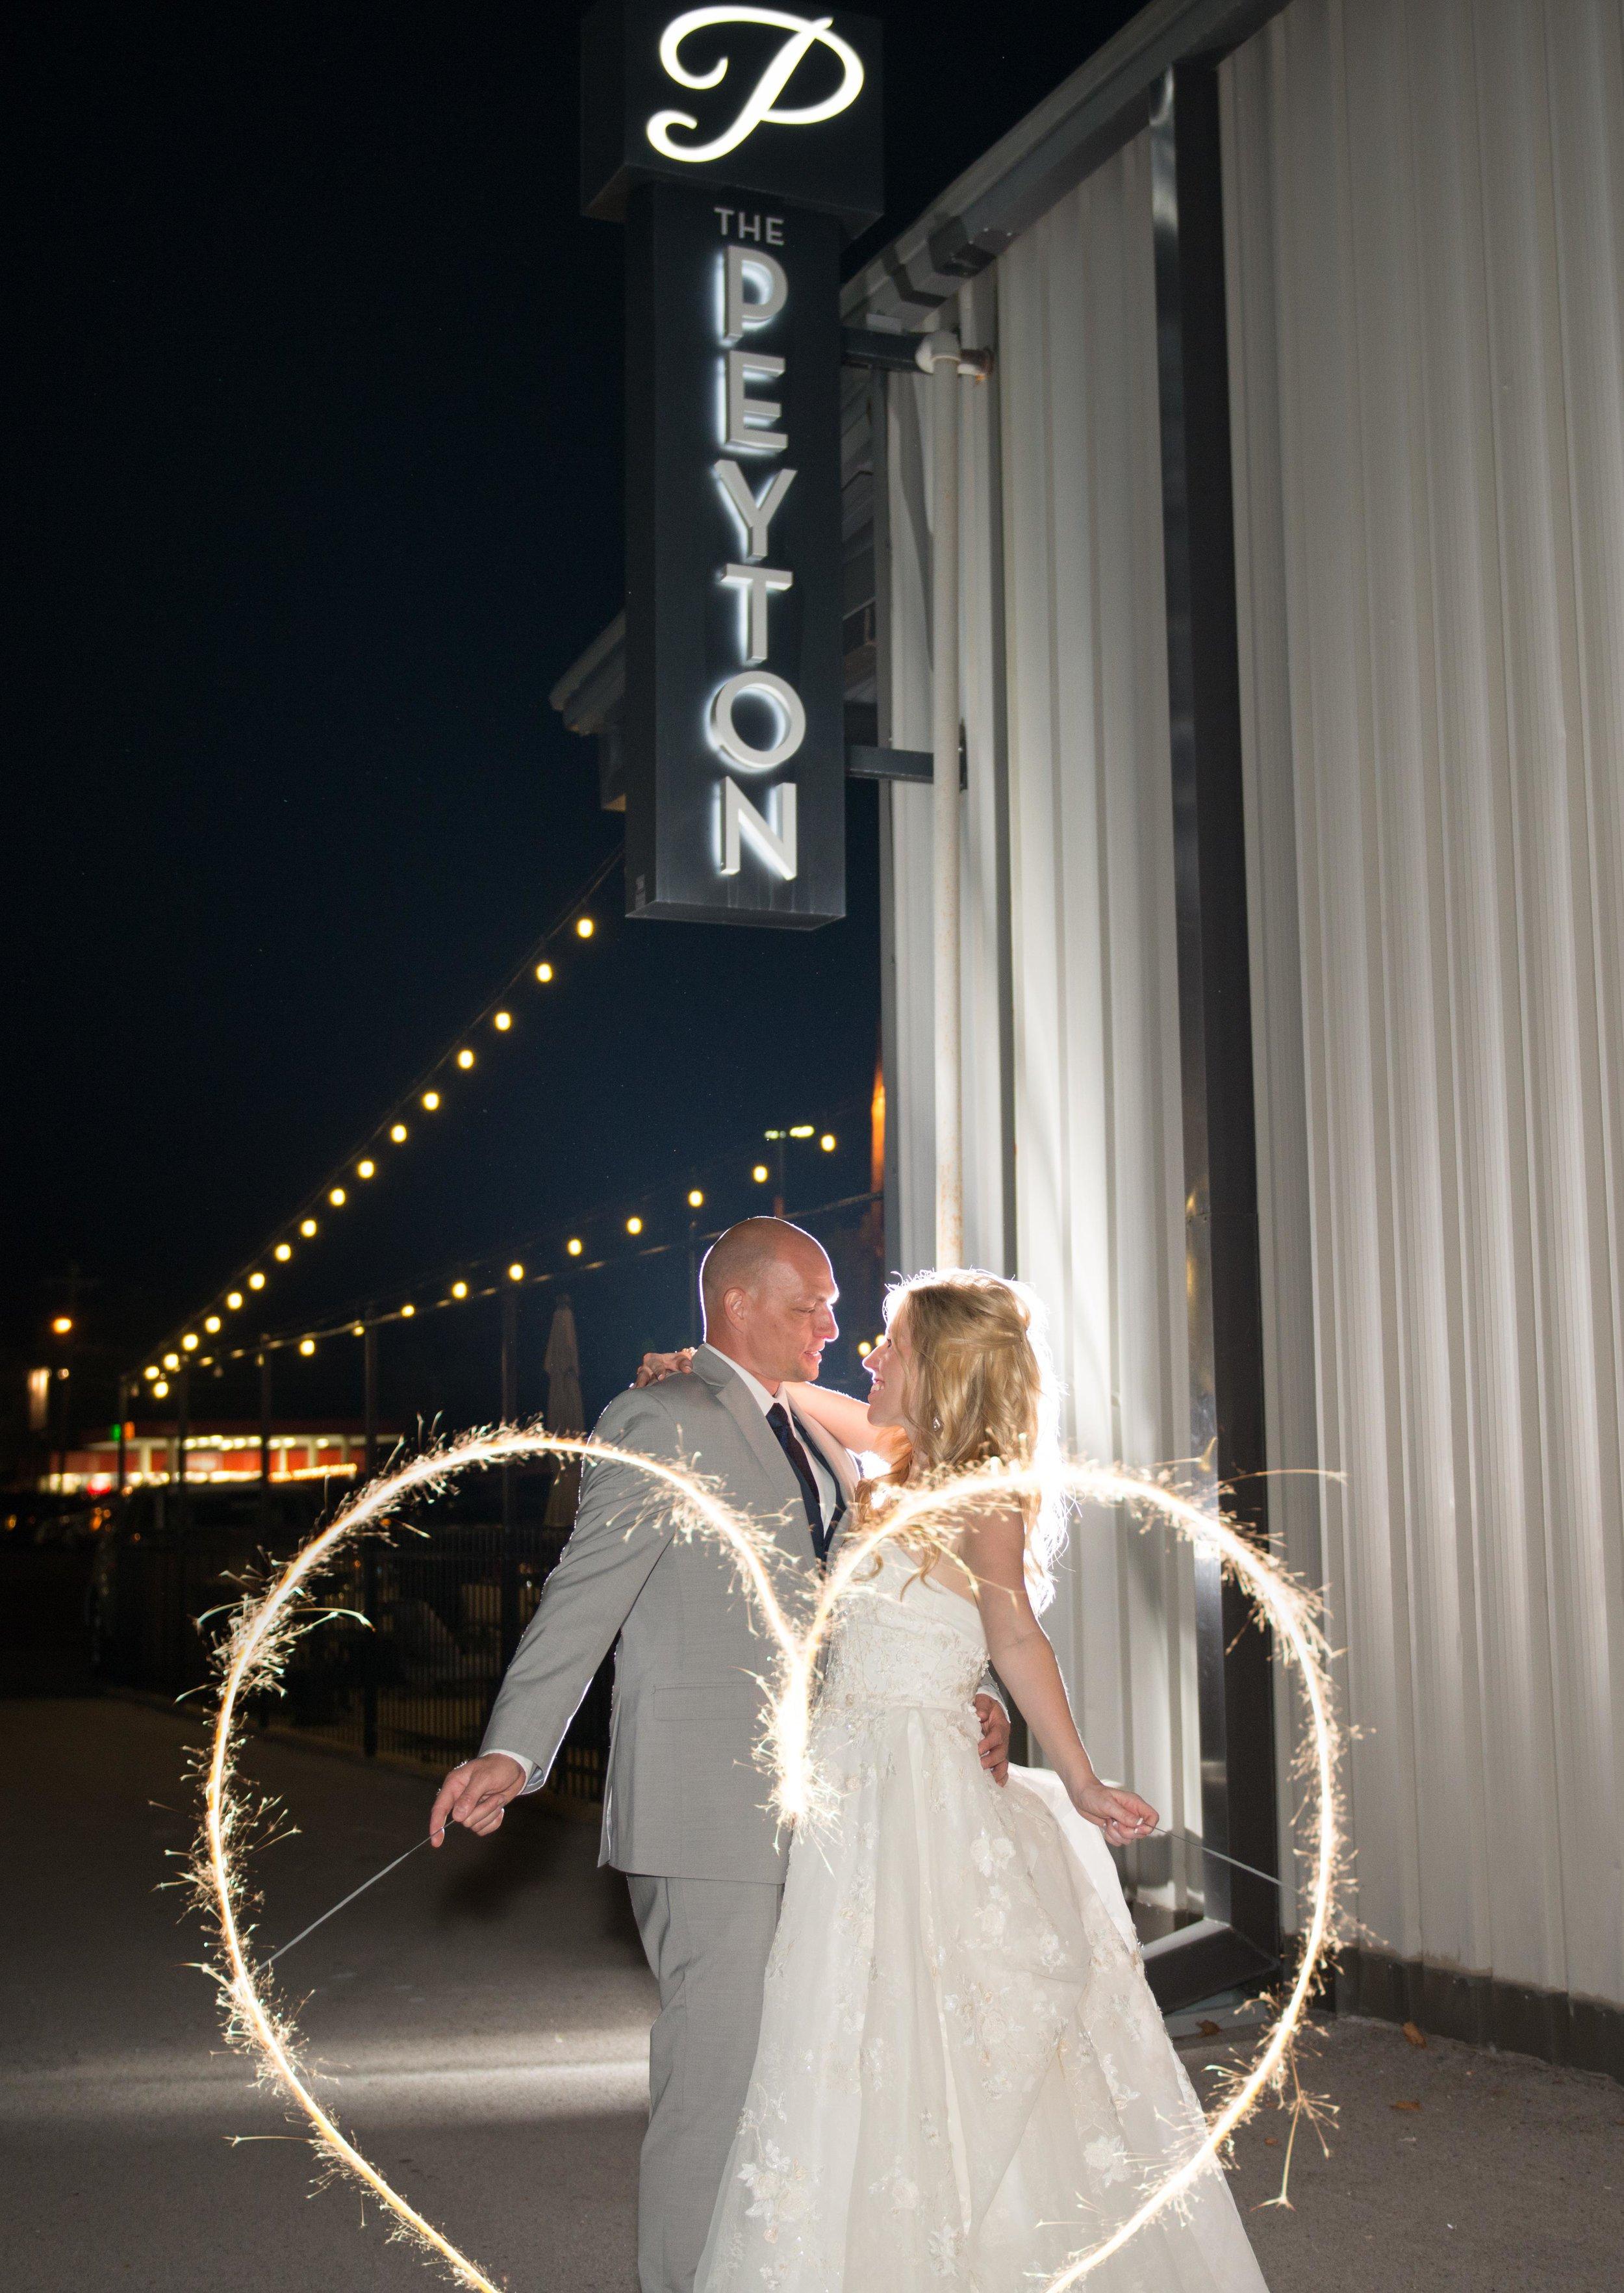 00001_Kuhnert-Wedding-118.jpg